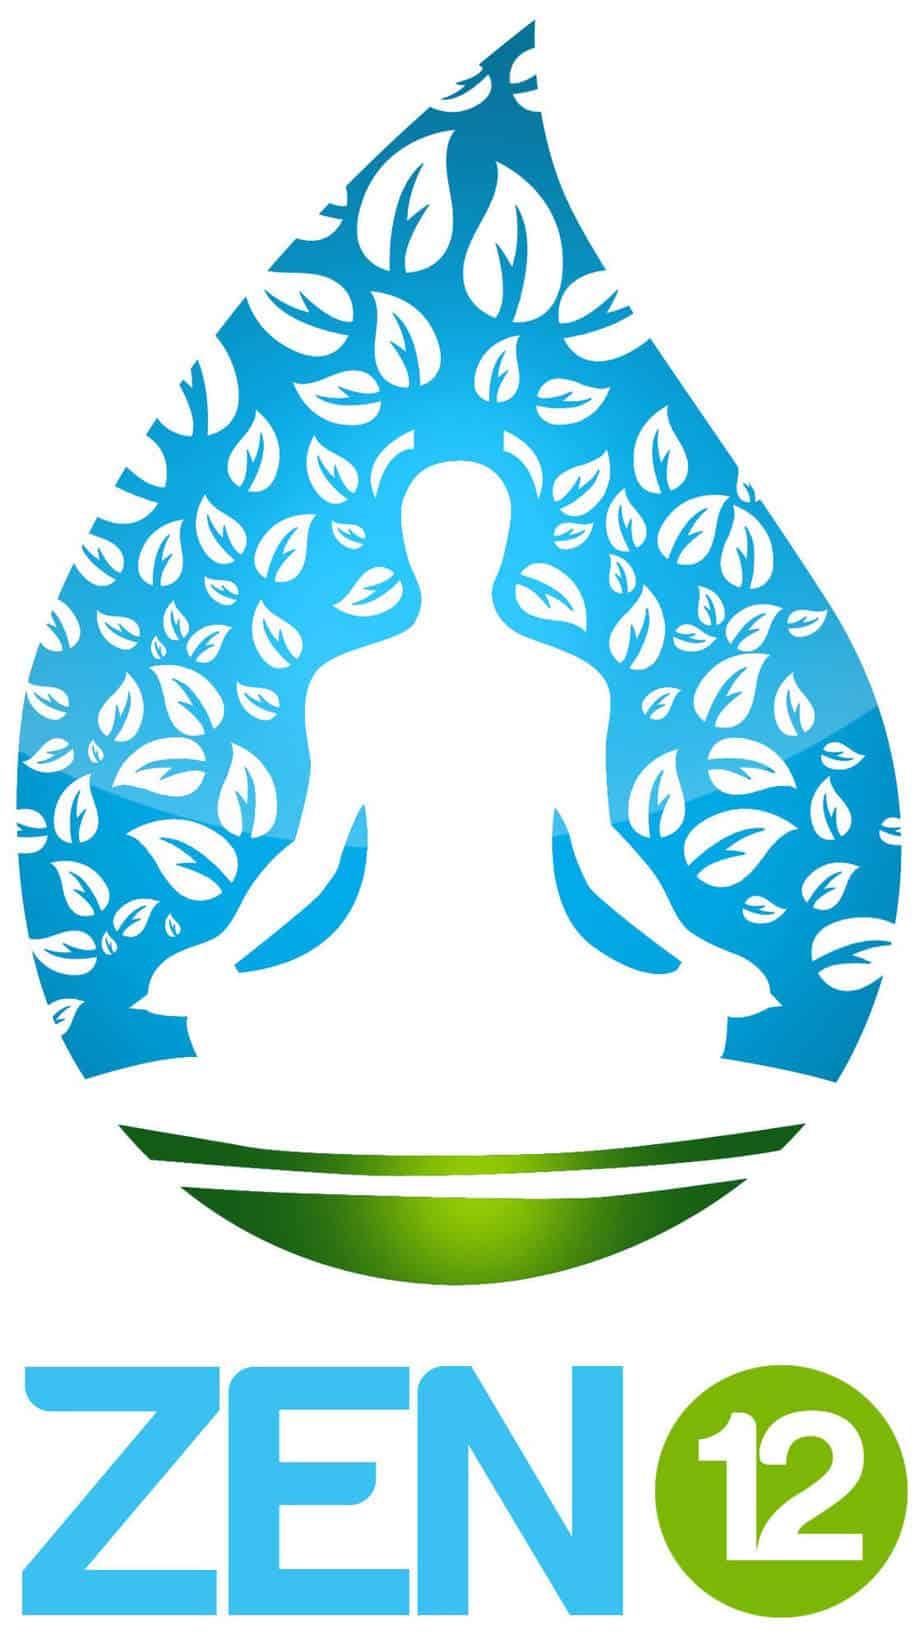 Image of the Zen 12 Logo